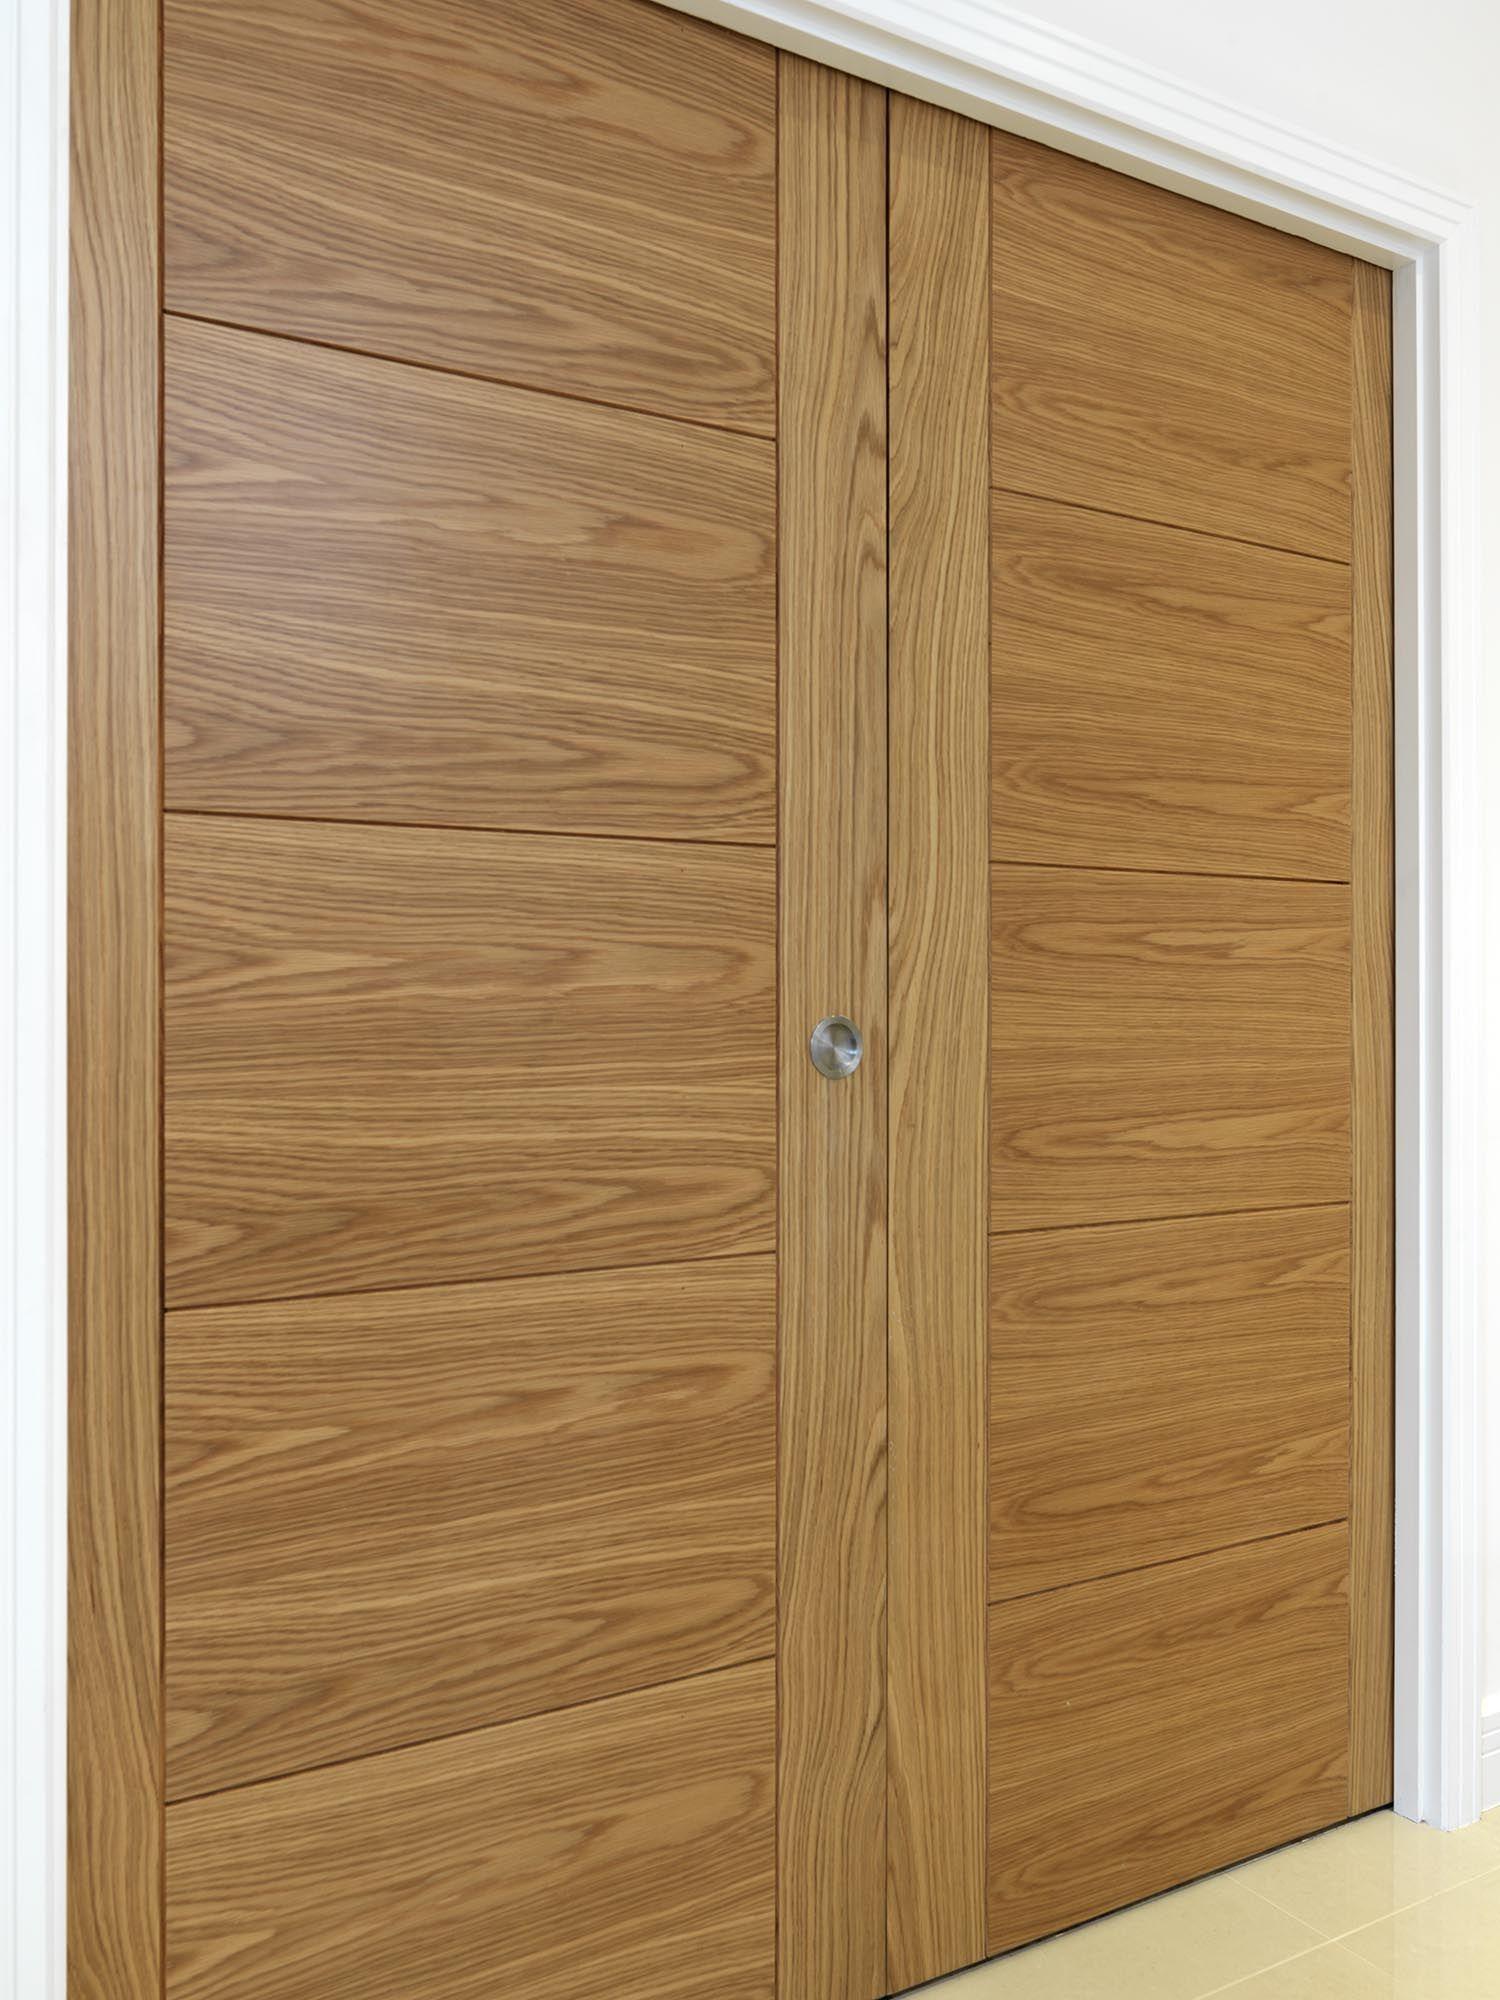 Beautiful Oak Veneered Doors Fitted Into A Pocket Door System. JB Kindu0027s  River Oak